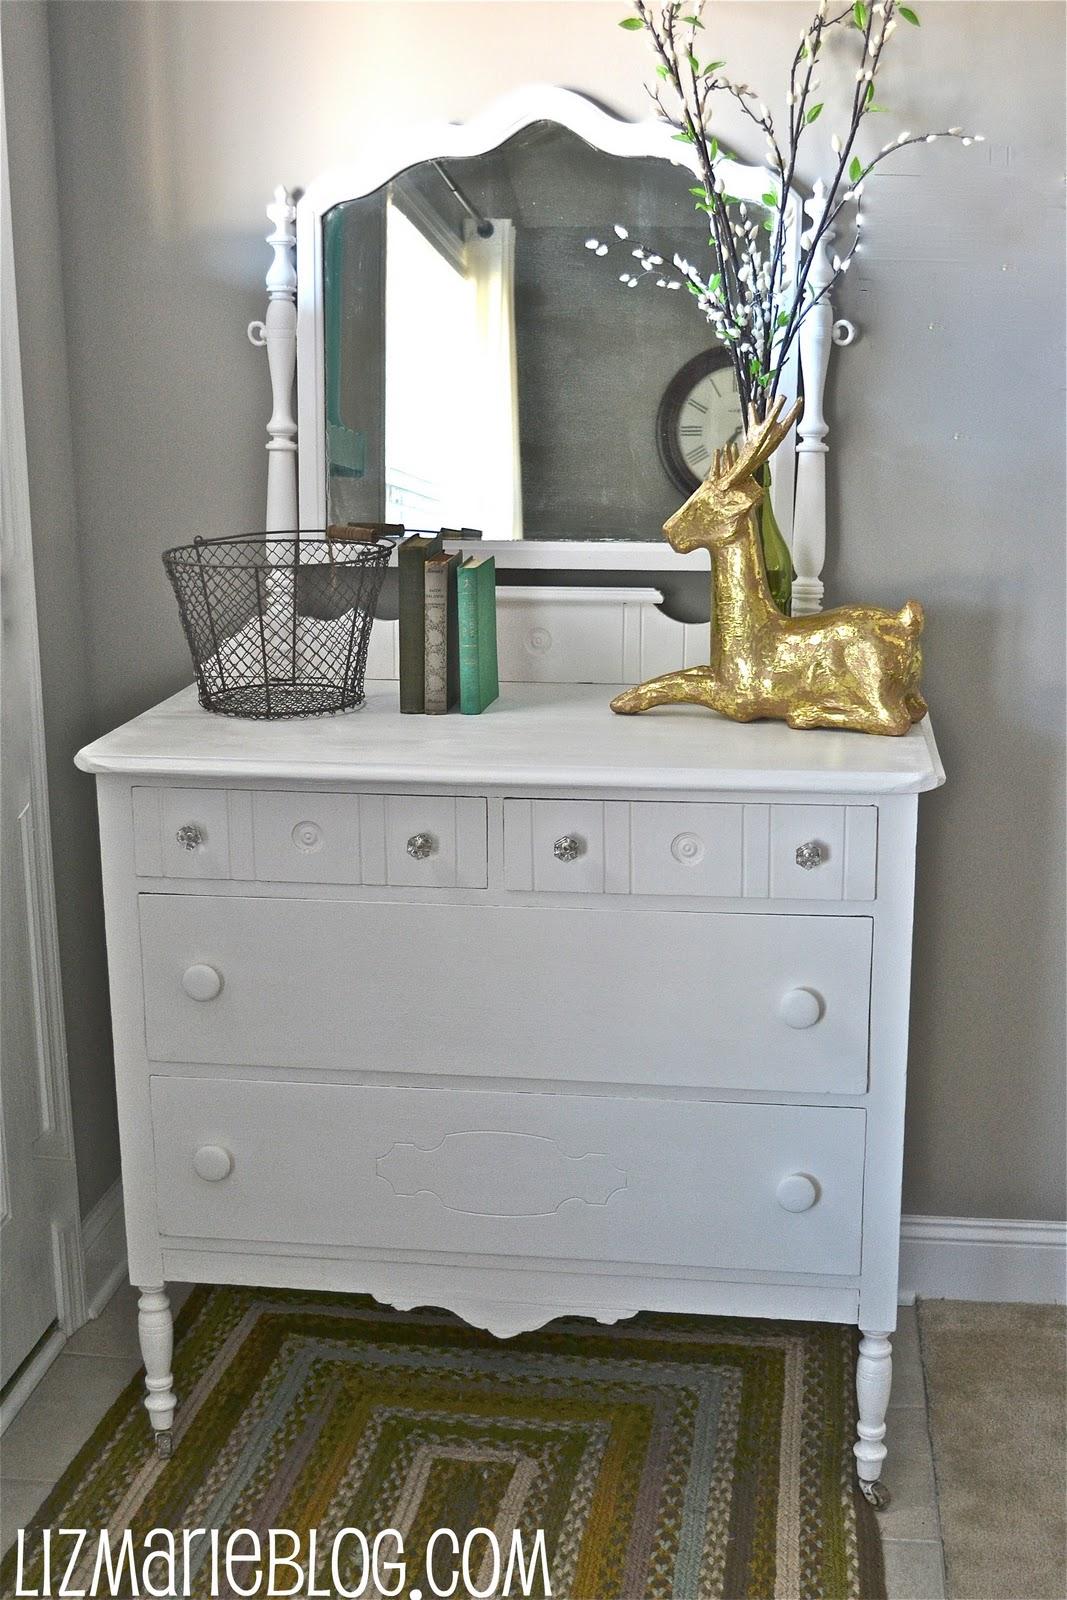 homemade chalk paint liz marie blog. Black Bedroom Furniture Sets. Home Design Ideas